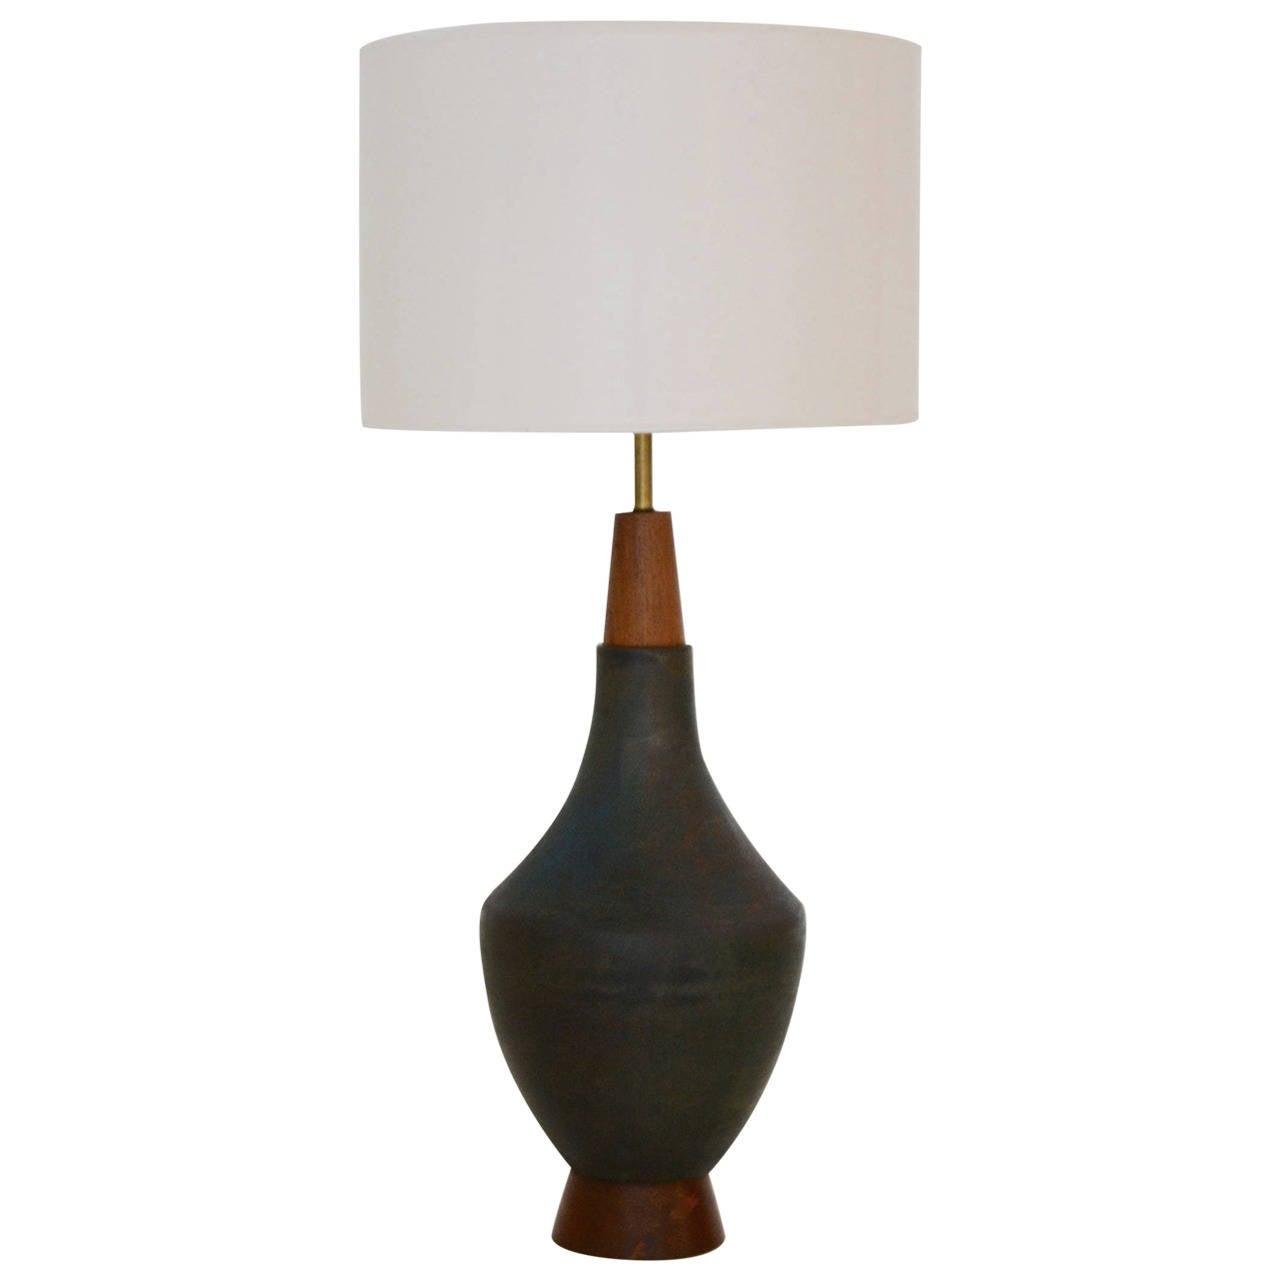 mid century modern ceramic table lamp. Black Bedroom Furniture Sets. Home Design Ideas